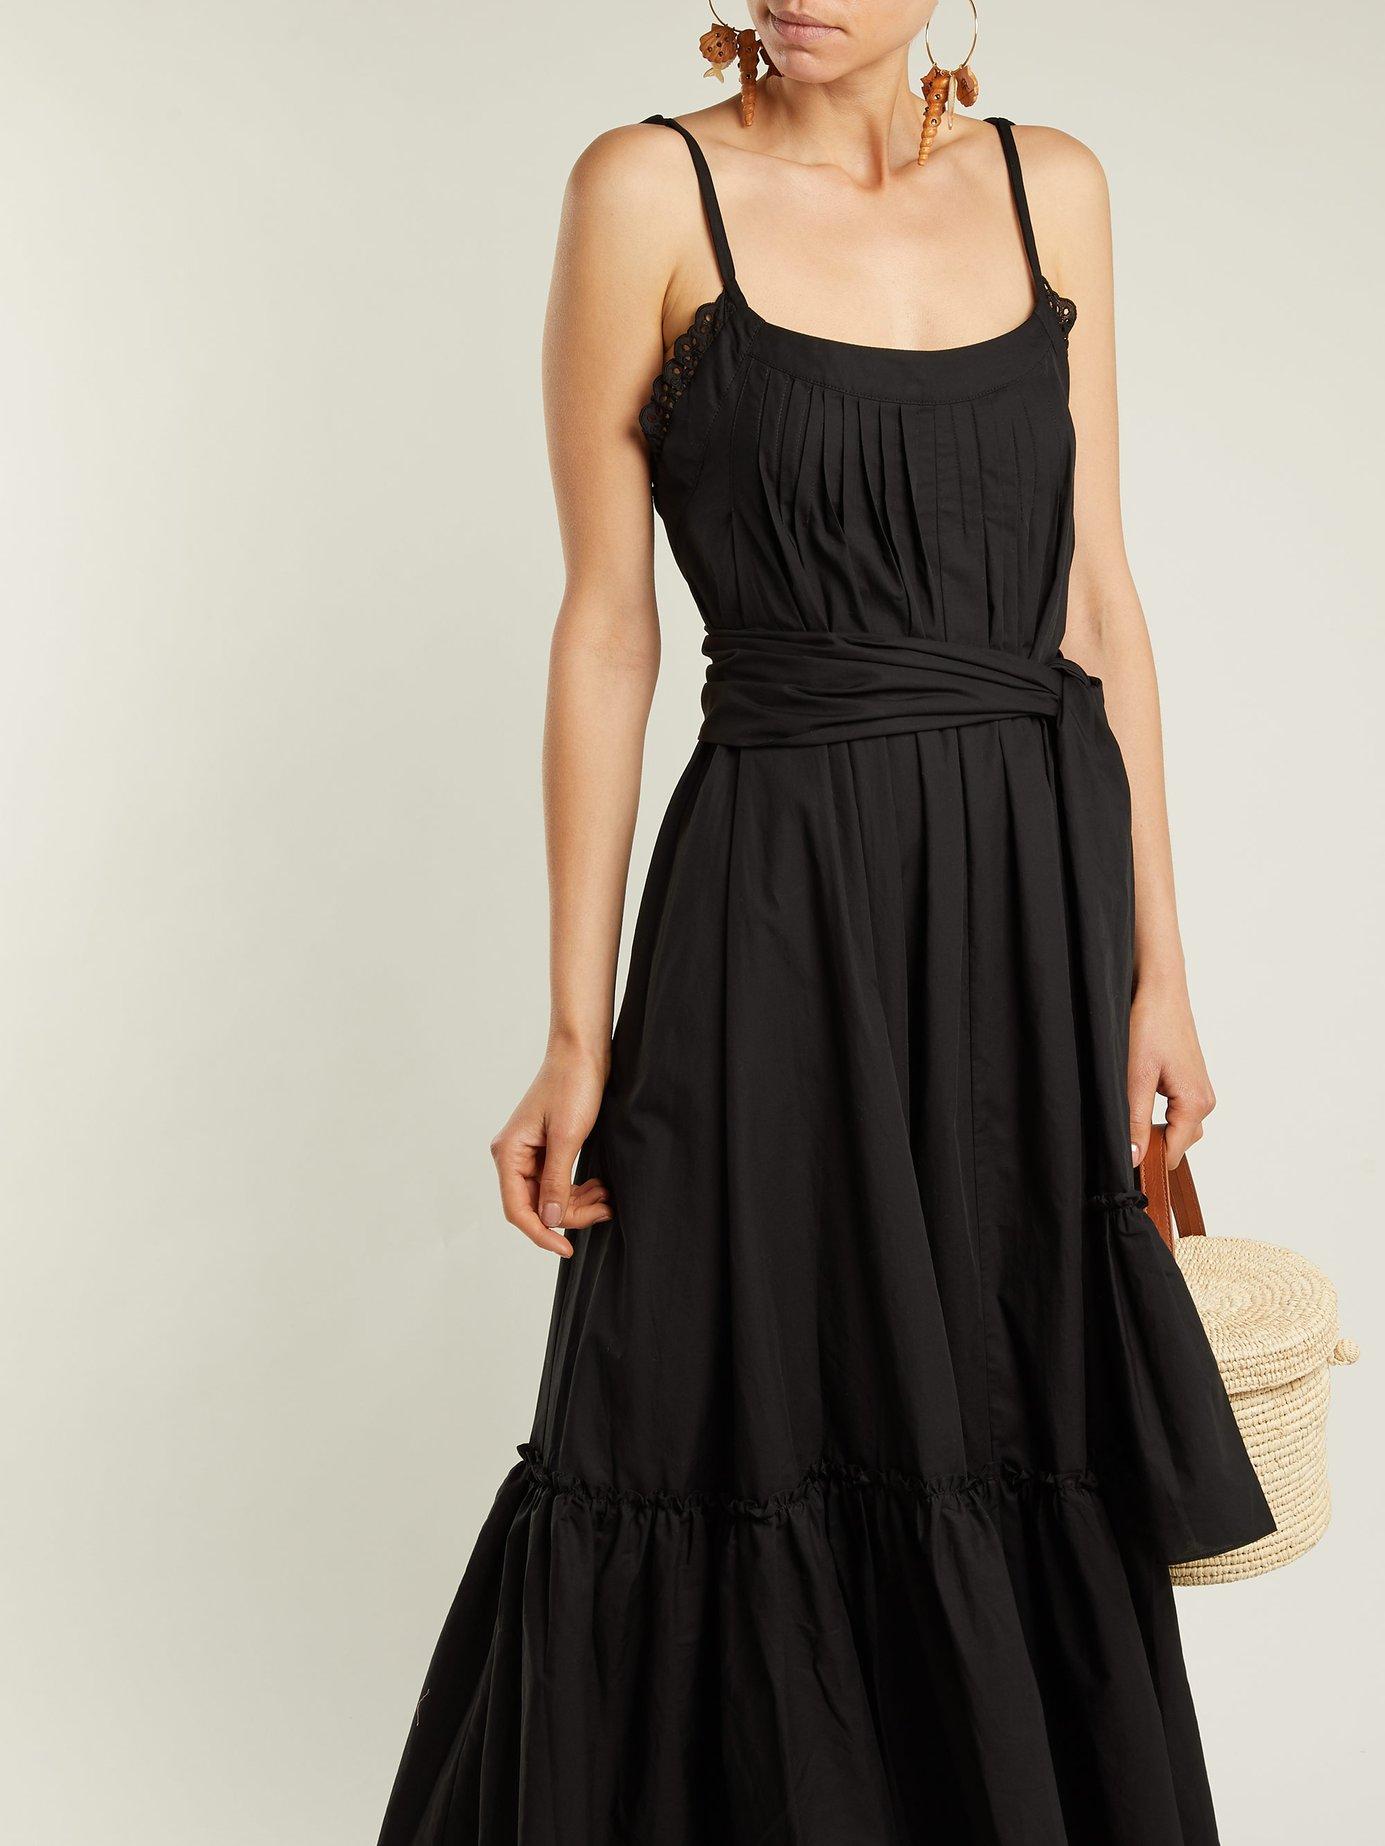 Ariadne pintucked cotton-poplin dress by Three Graces London